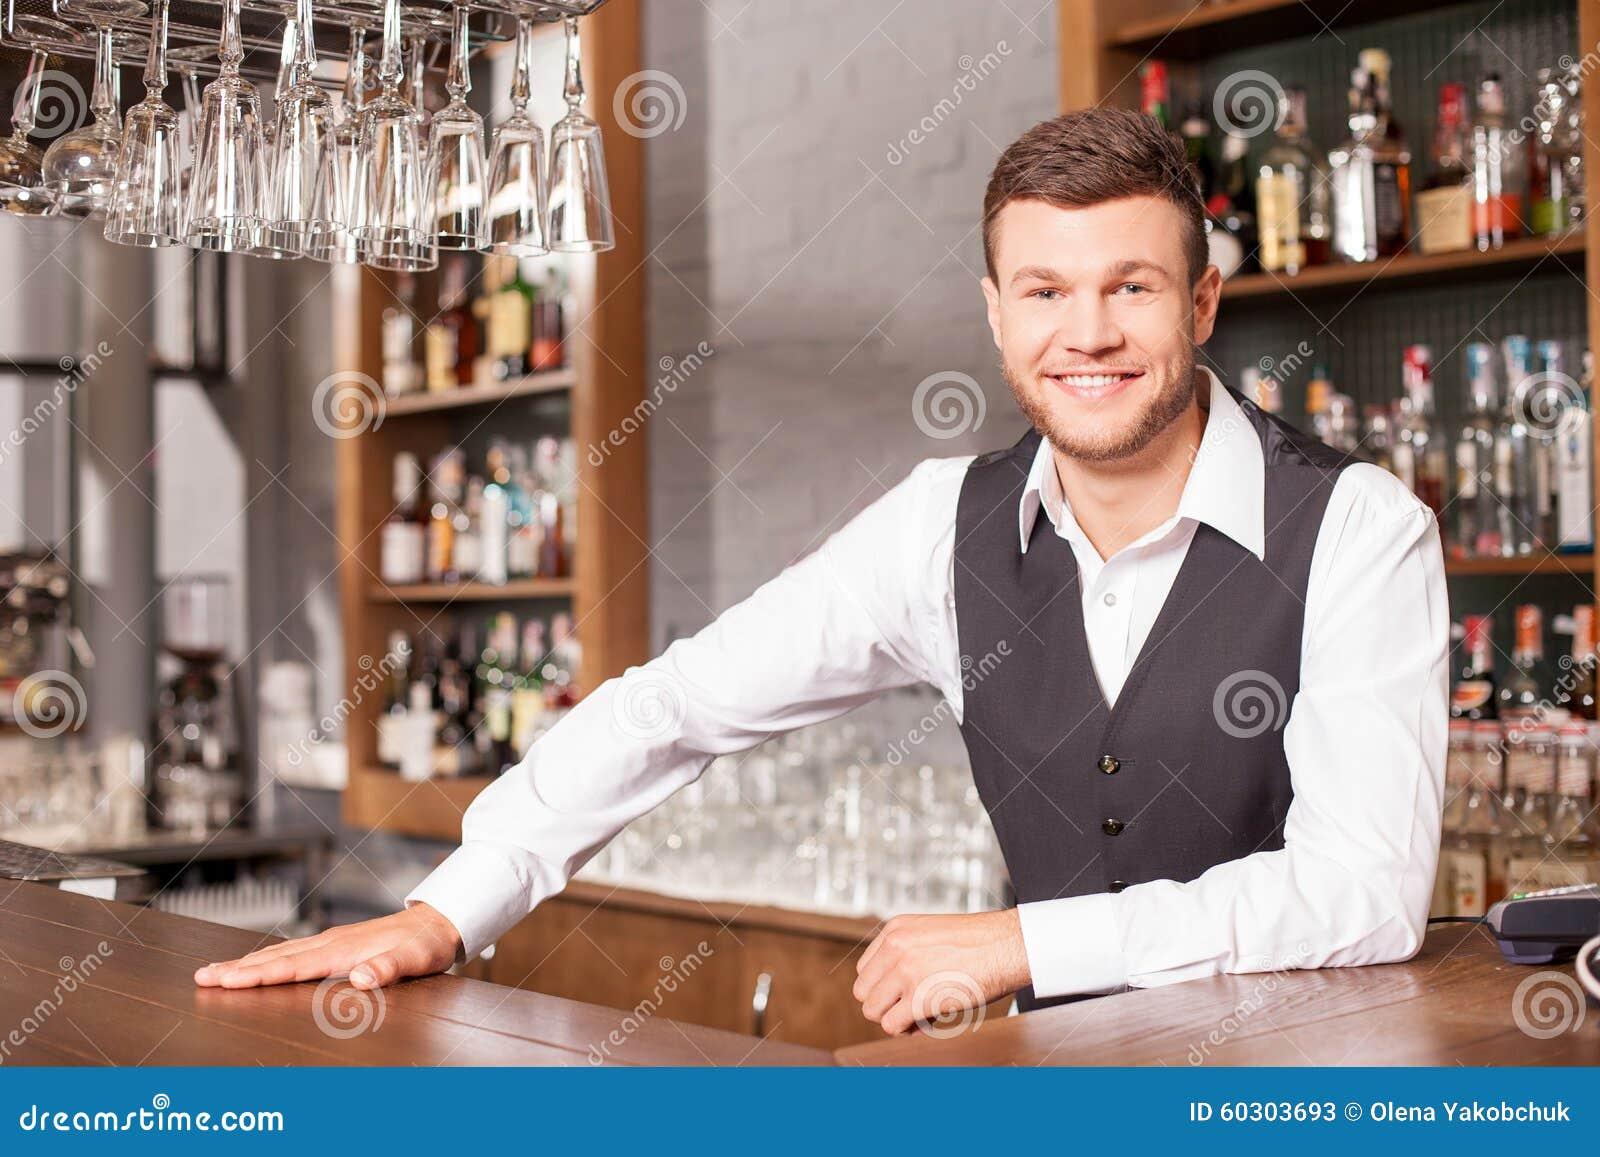 working in a pub